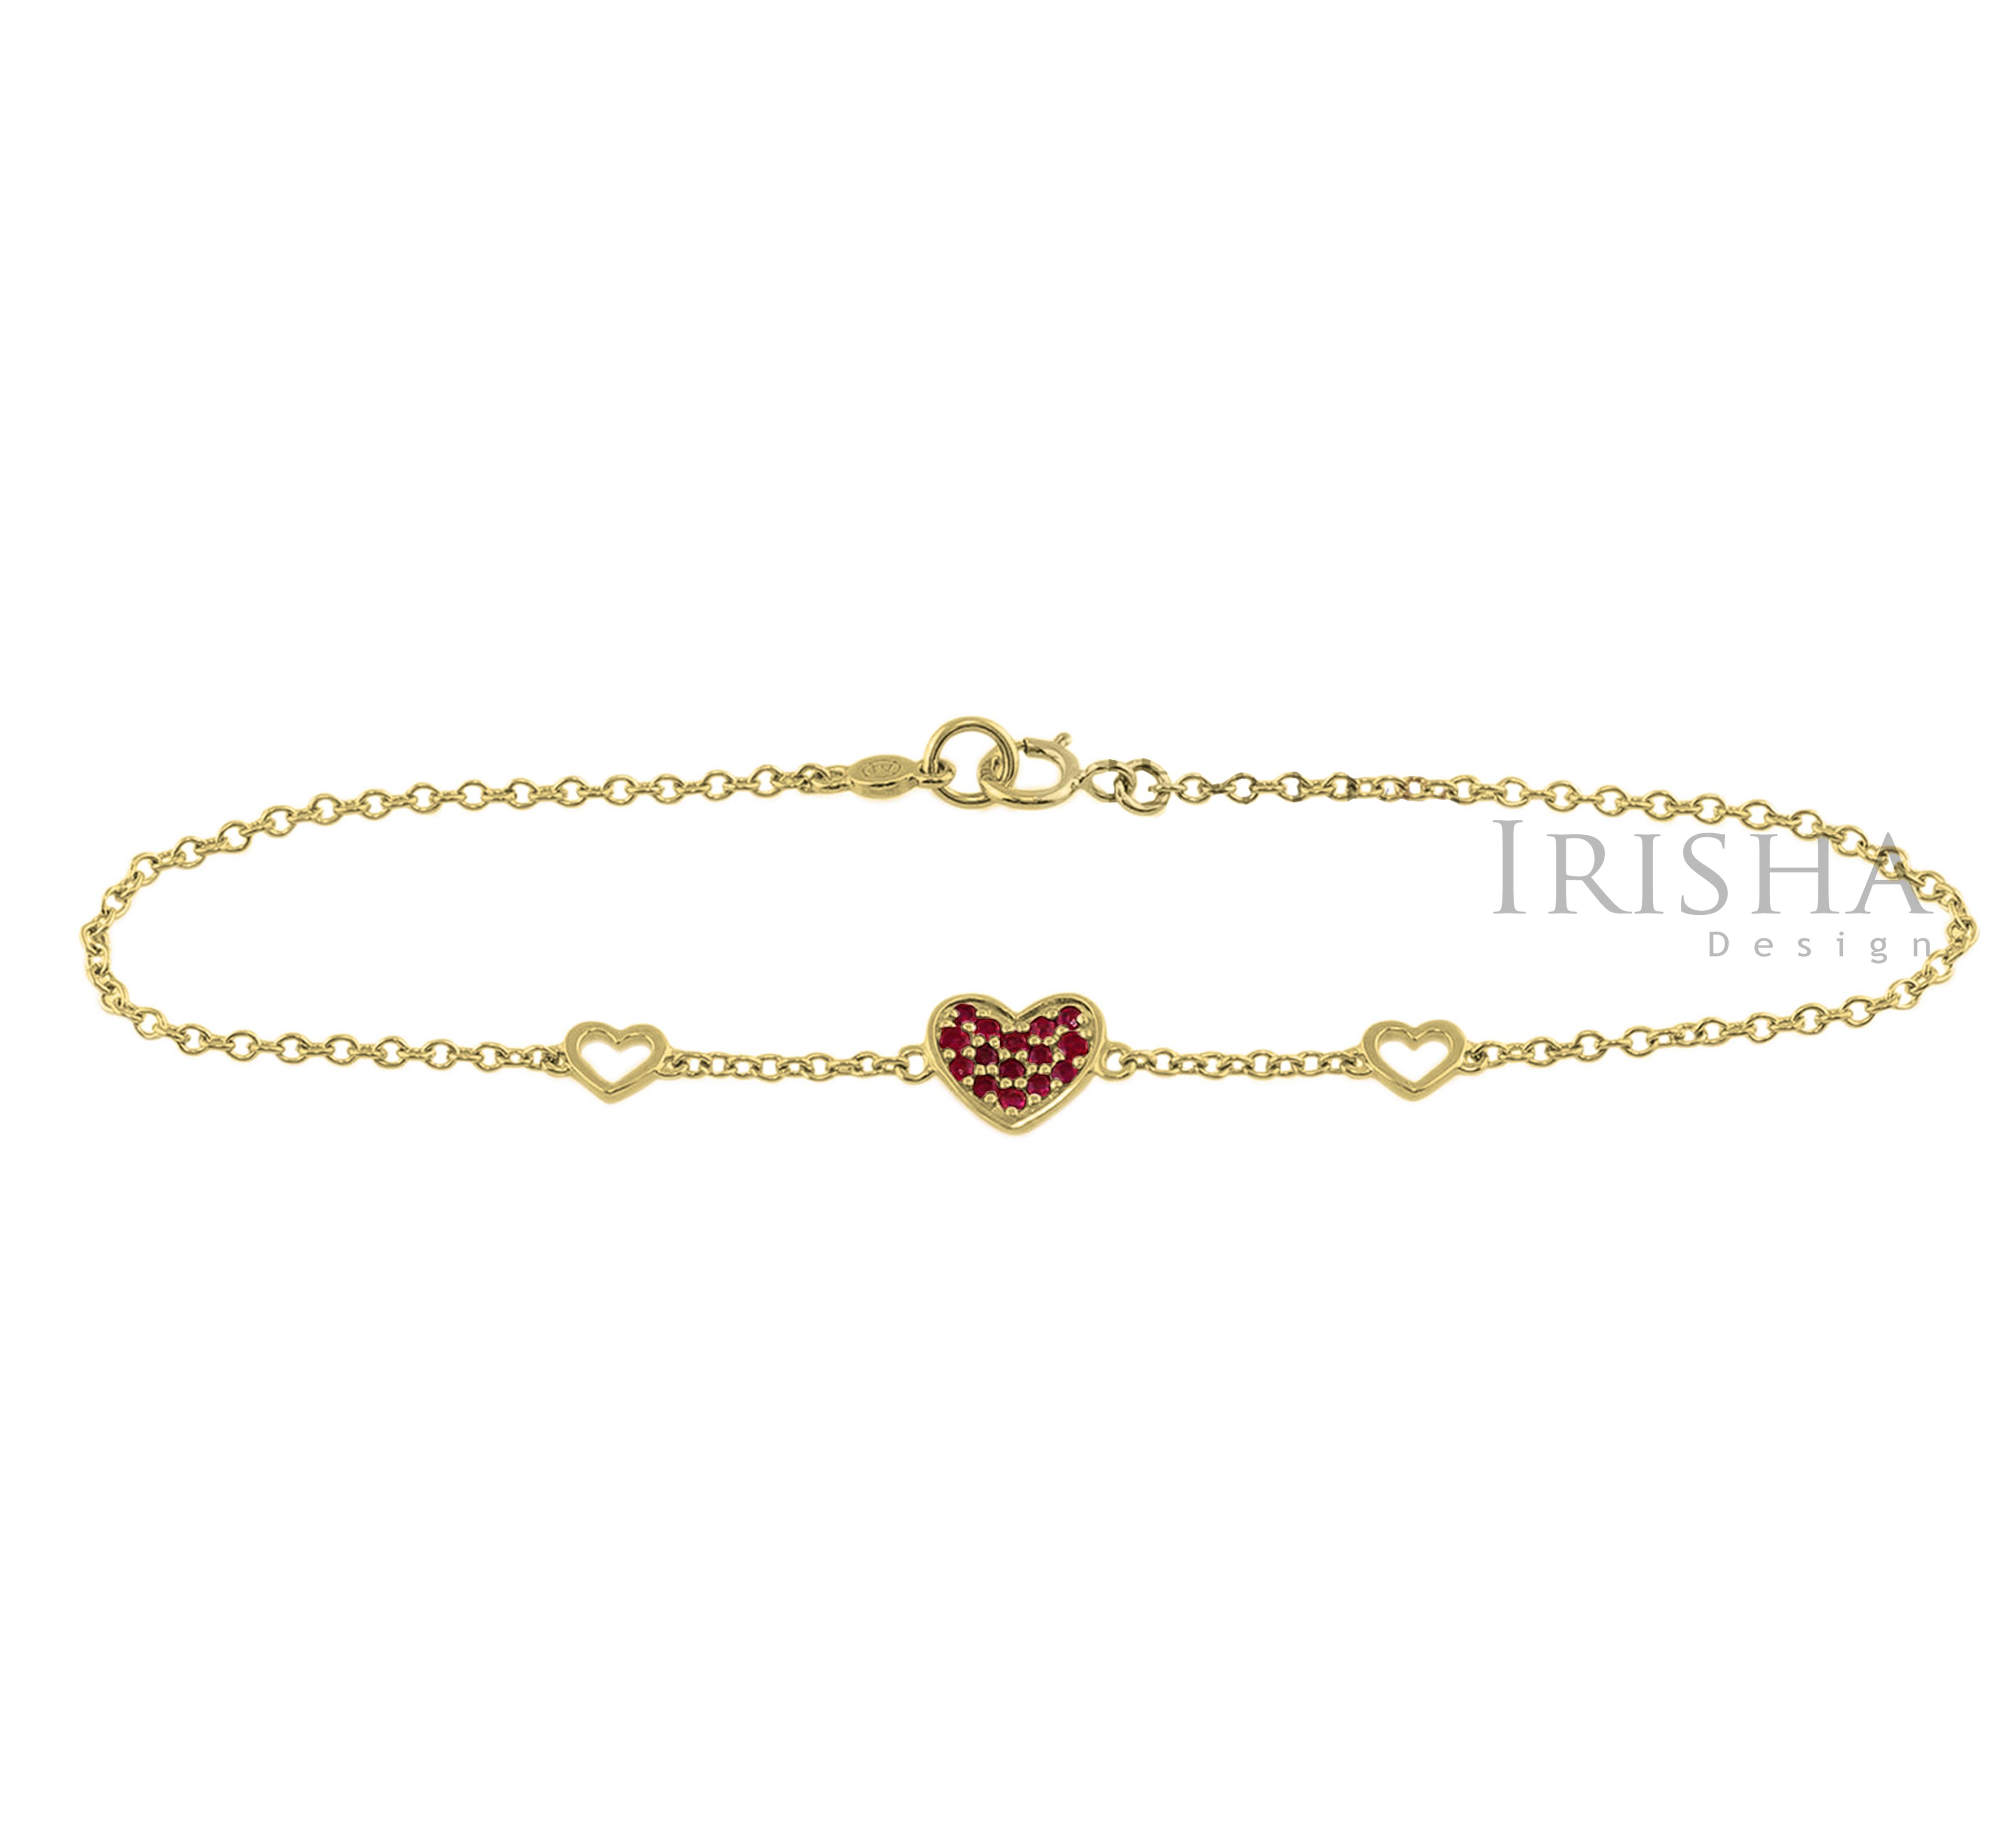 14K Gold 0.20 Ct. Genuine Ruby Gemstone Heart Bracelet Mother's Day Fine Jewelry